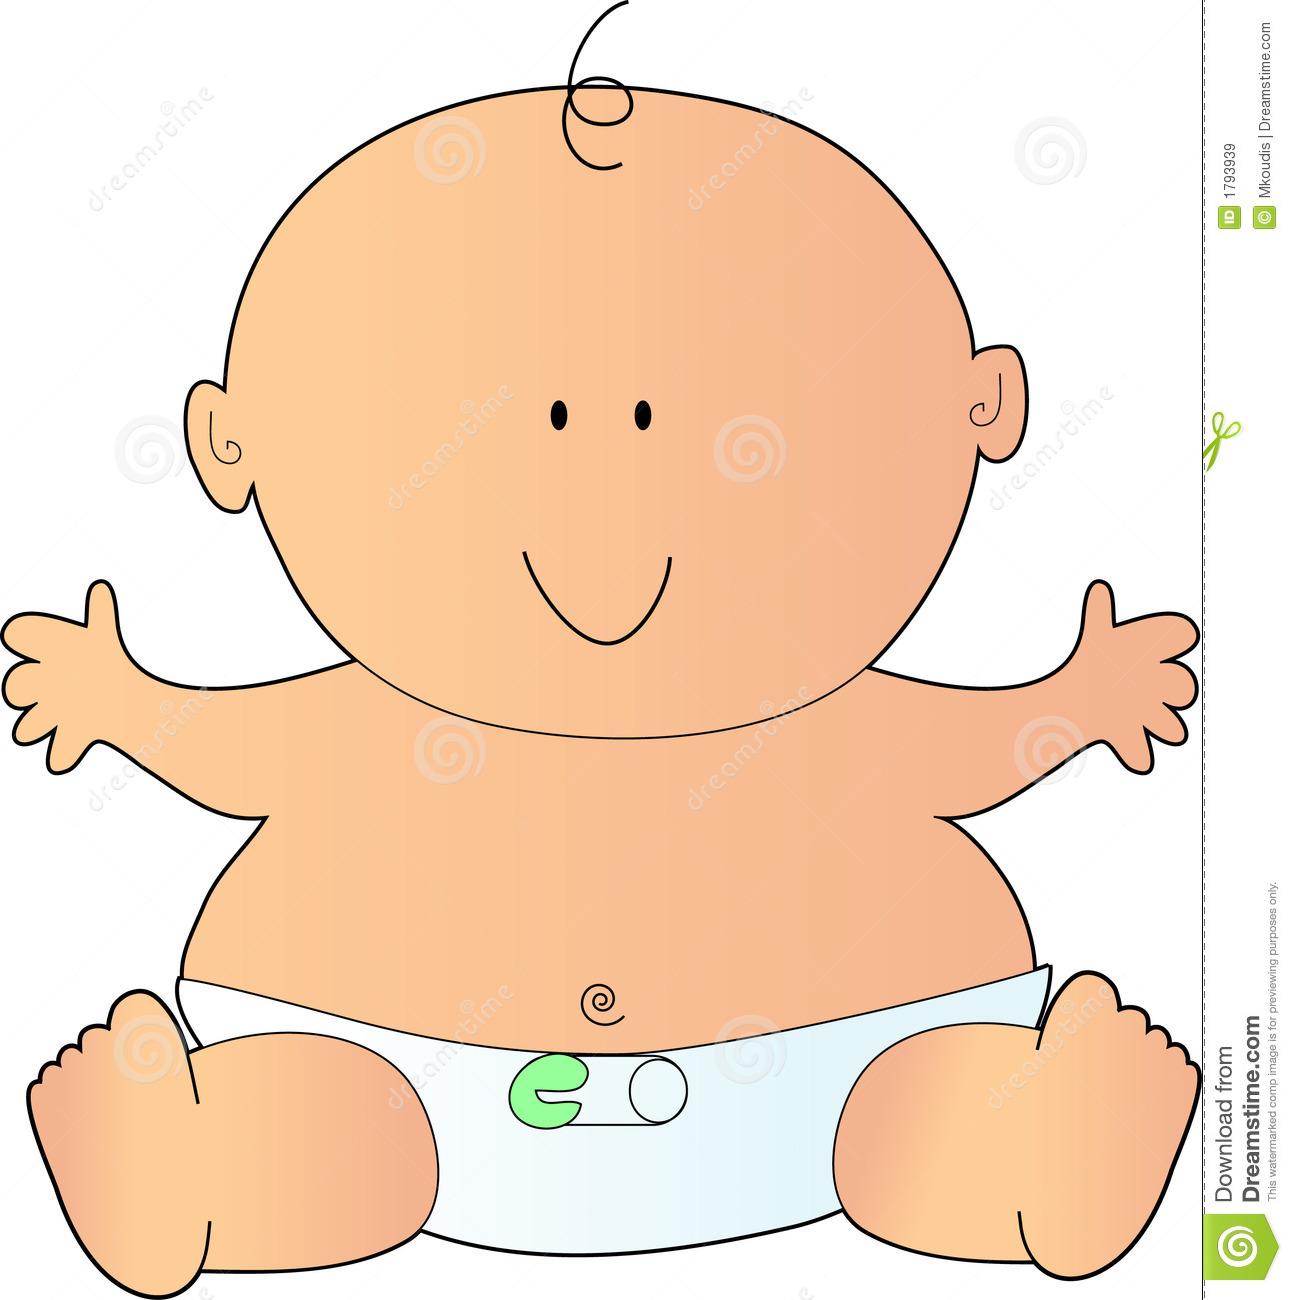 Newborn baby clipart.